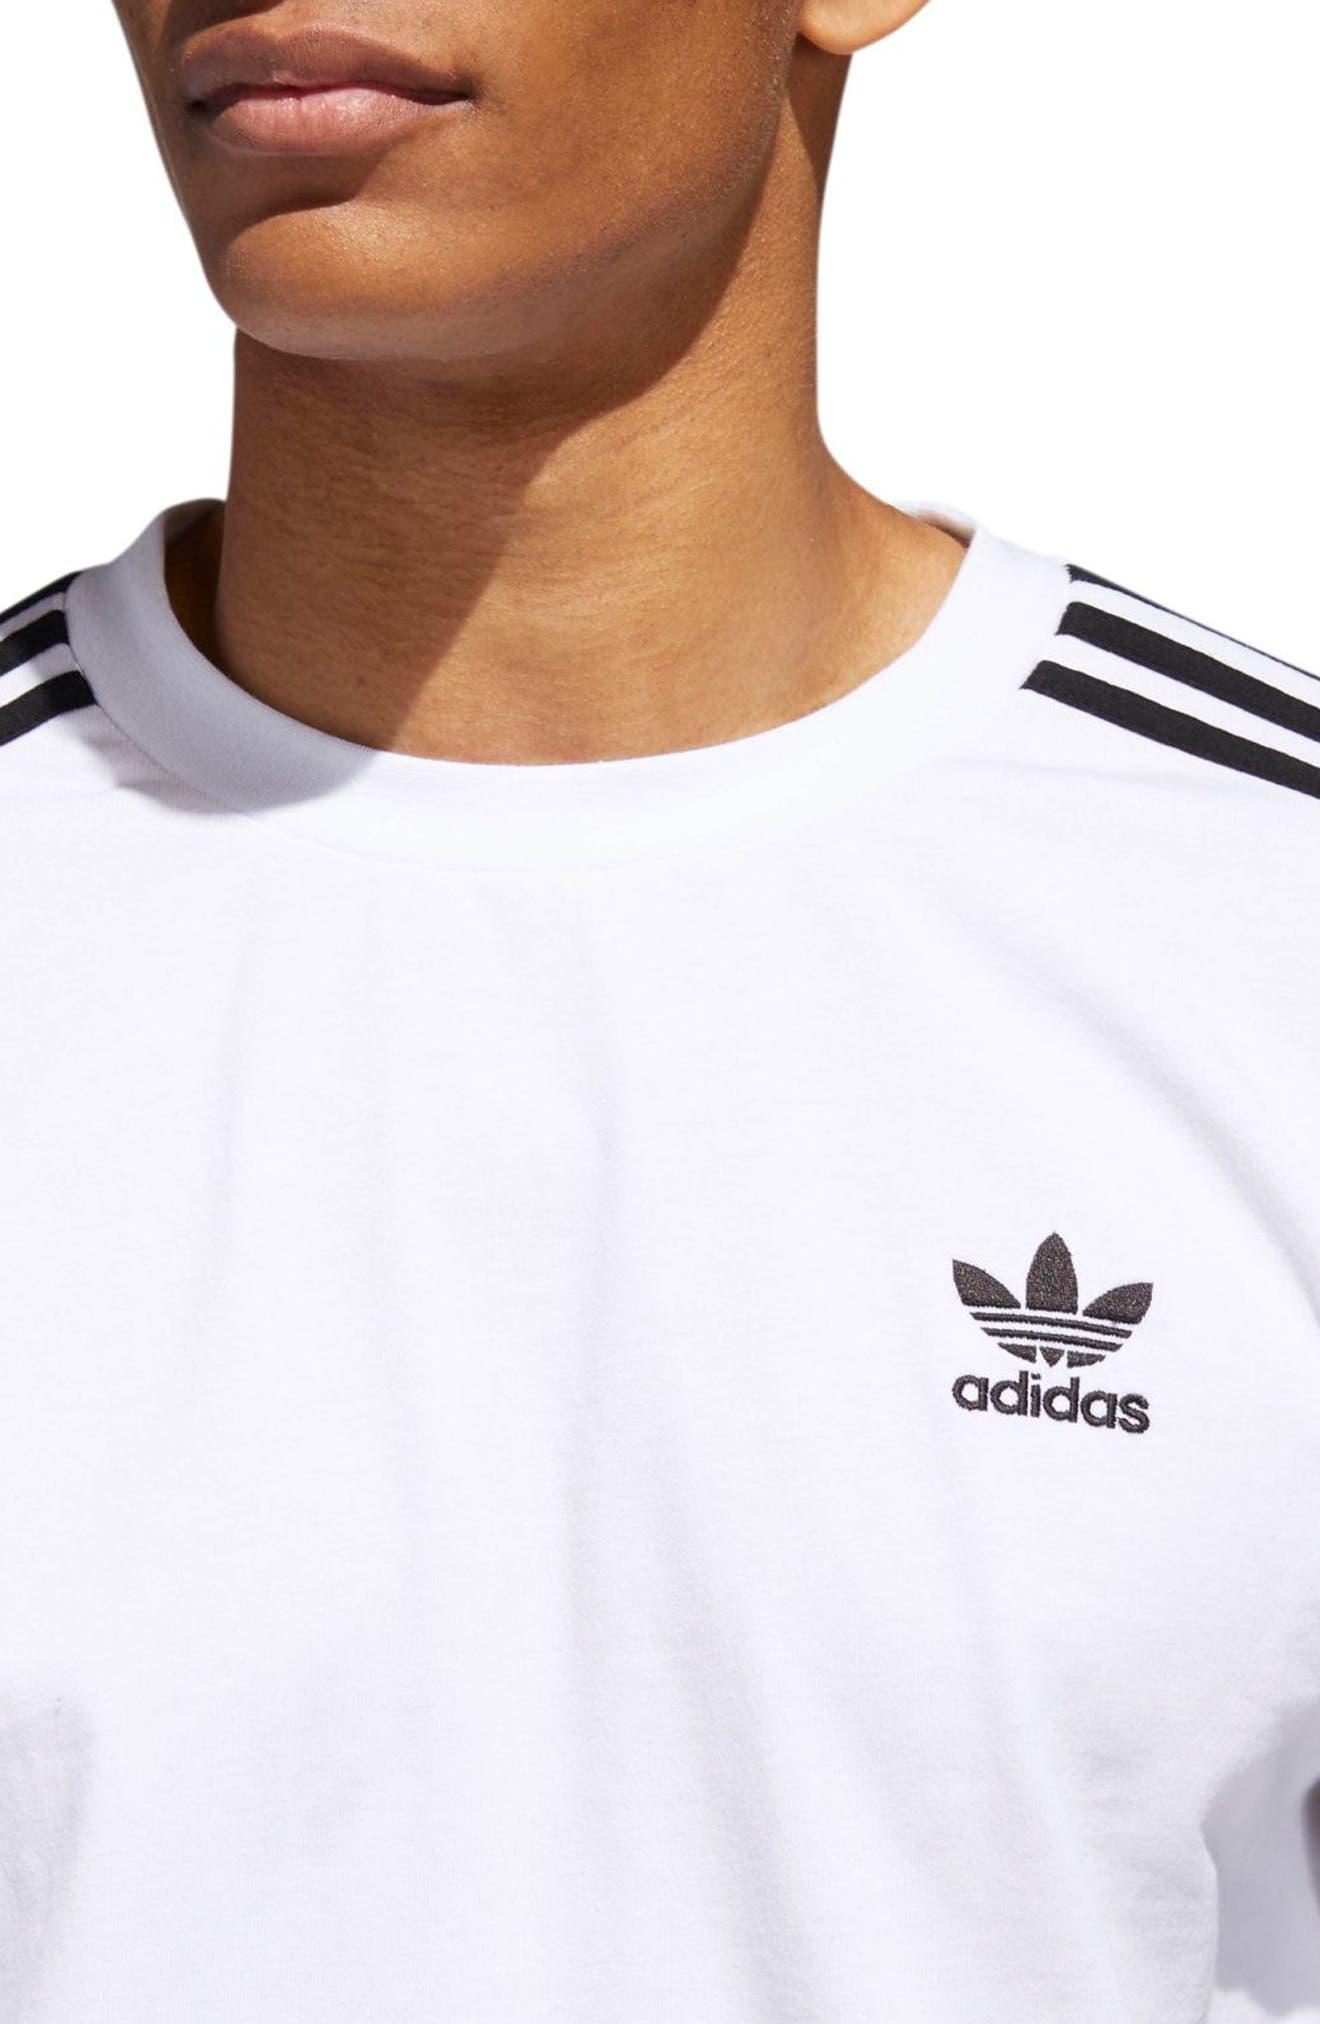 Authentics Short Sleeve T-Shirt,                             Alternate thumbnail 4, color,                             100